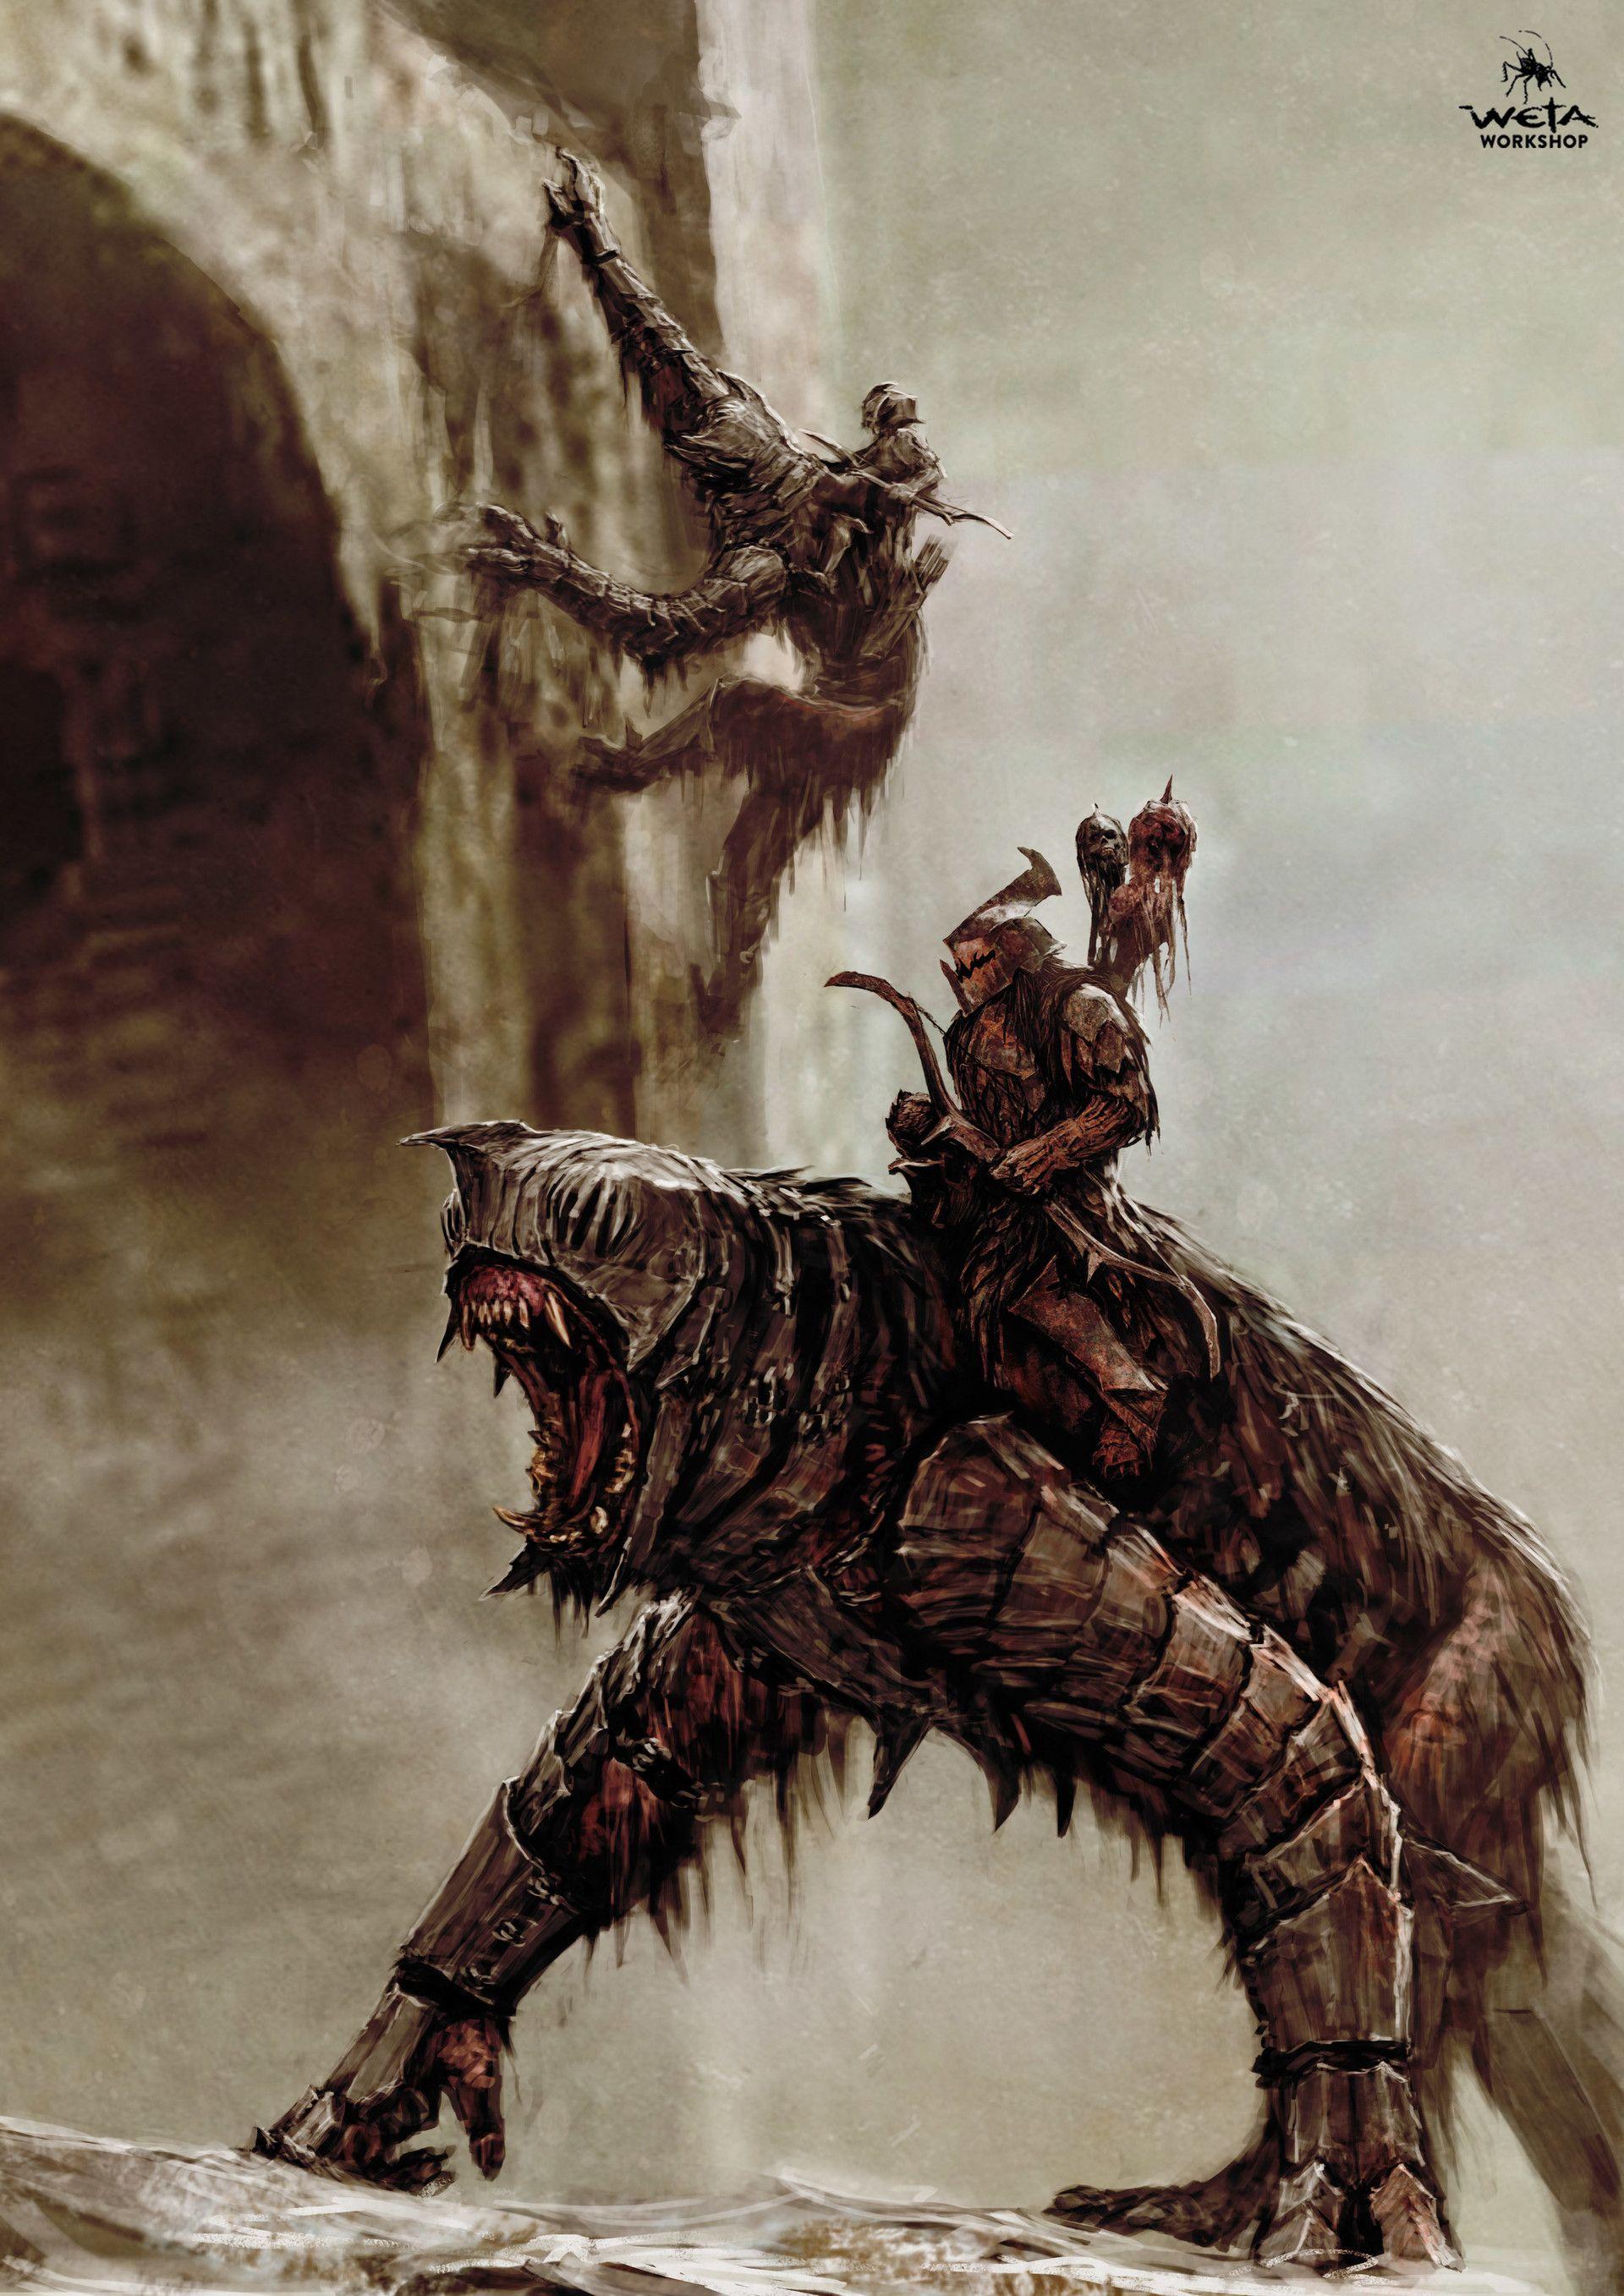 Artstation The Hobbit Battle Of Five Armies Orc Creatures Weta